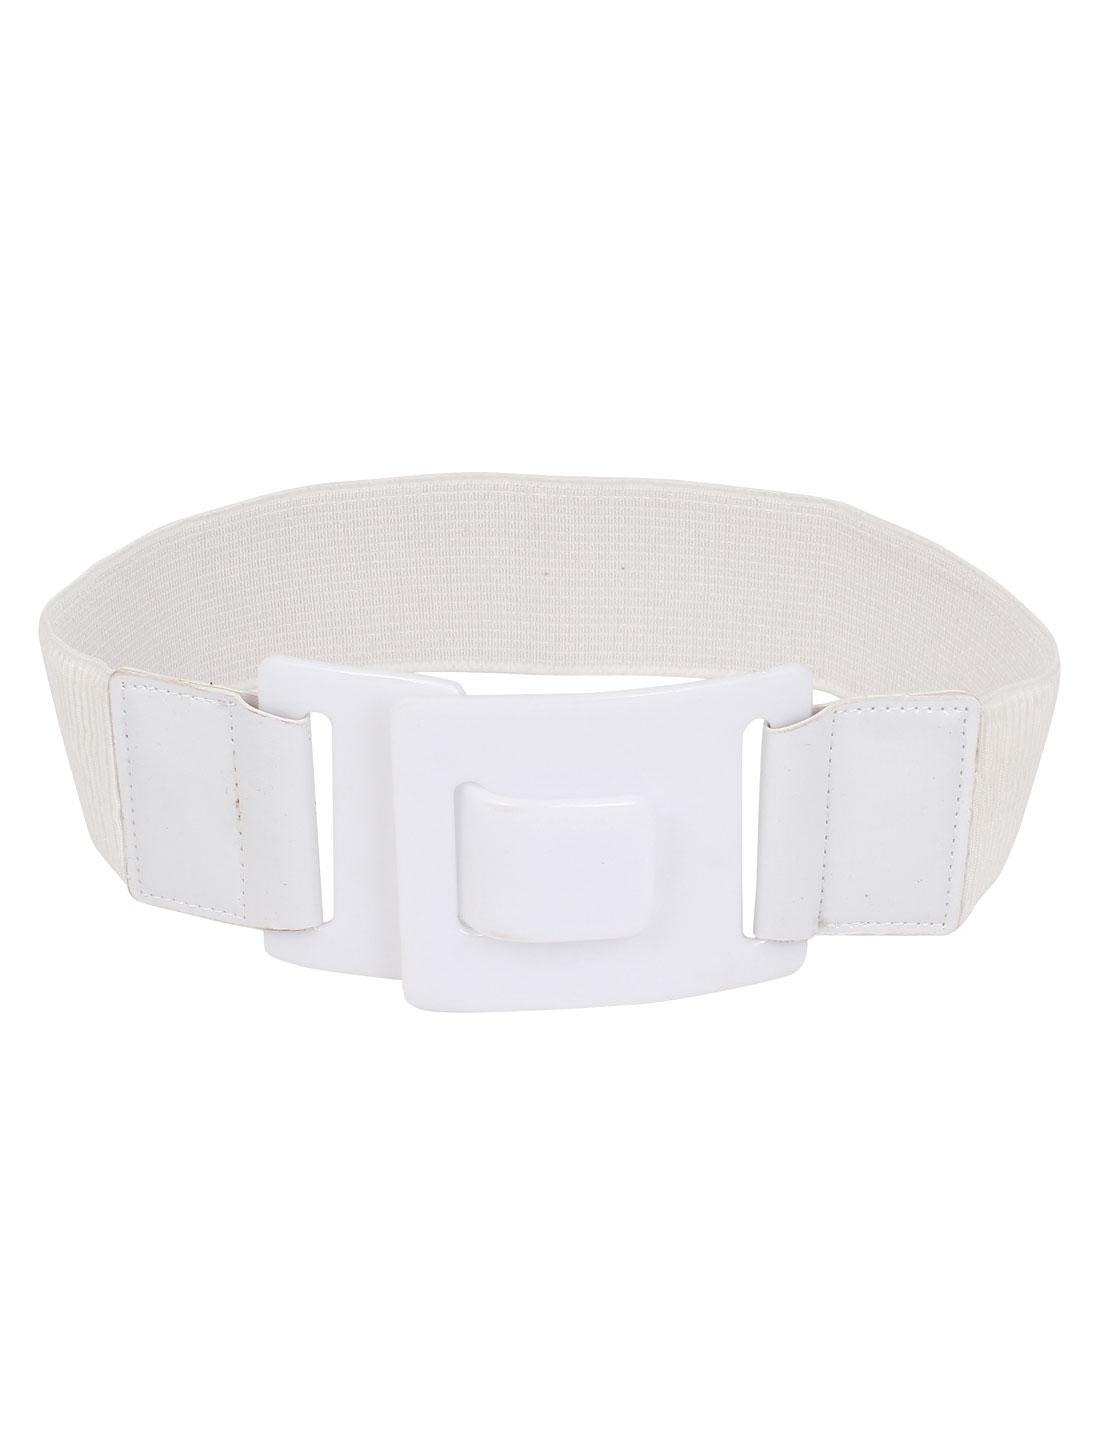 Women Plastic Interlock Buckle Faux Leather Stretch Cinch Waist Belt Band Waistband White